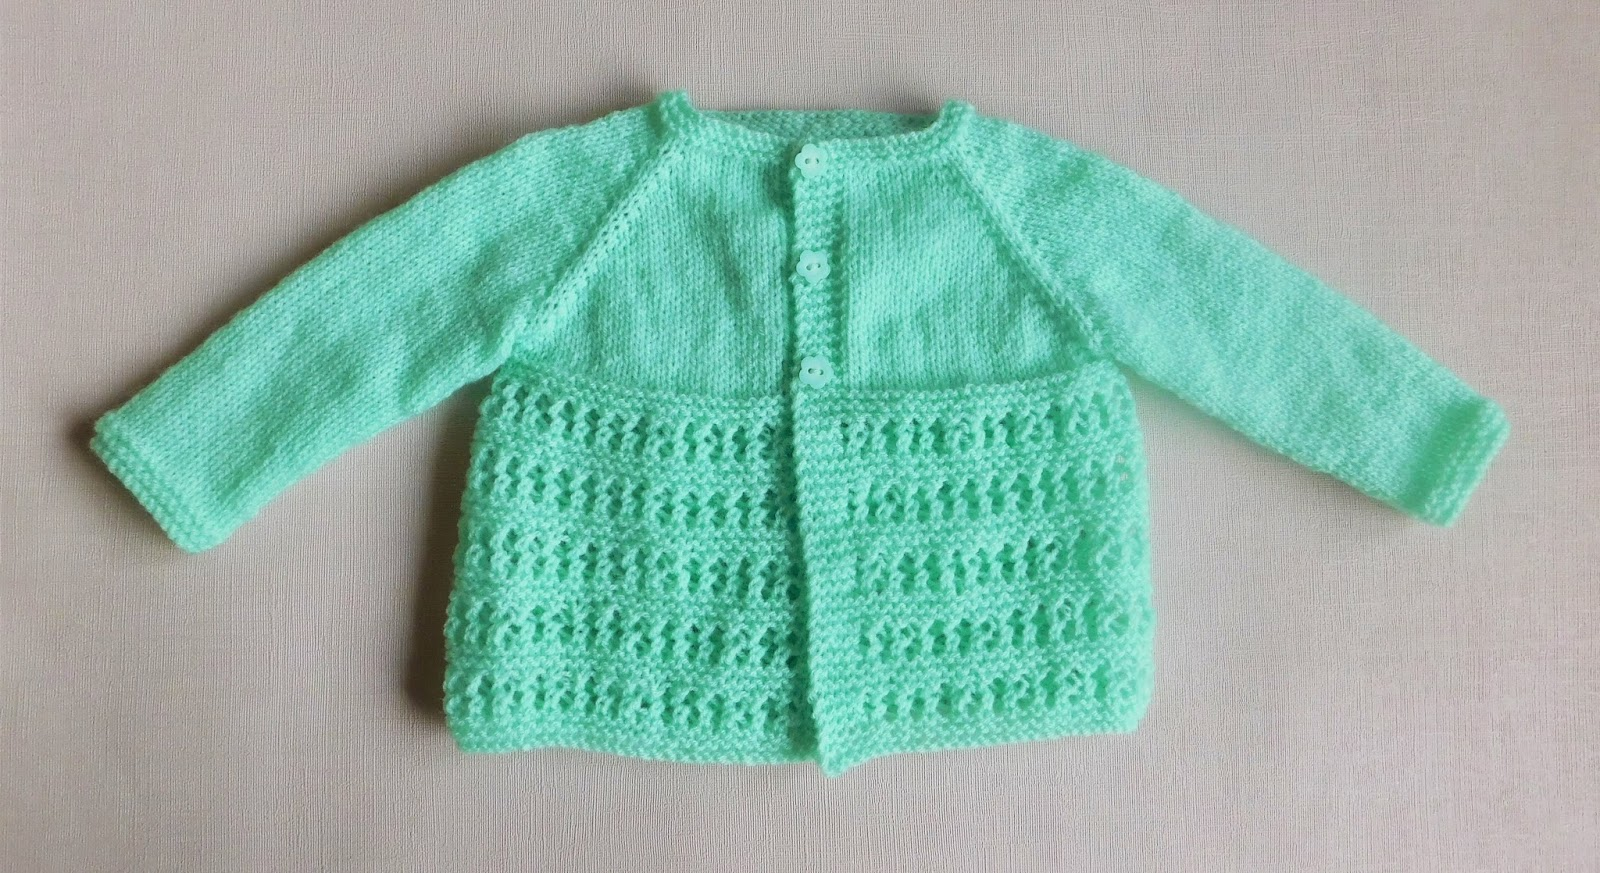 762c8f0ca988 ... sleek bf060 ec18f Mariannas Lazy Daisy Days Charlie Baby Cardigan Jacket  ...